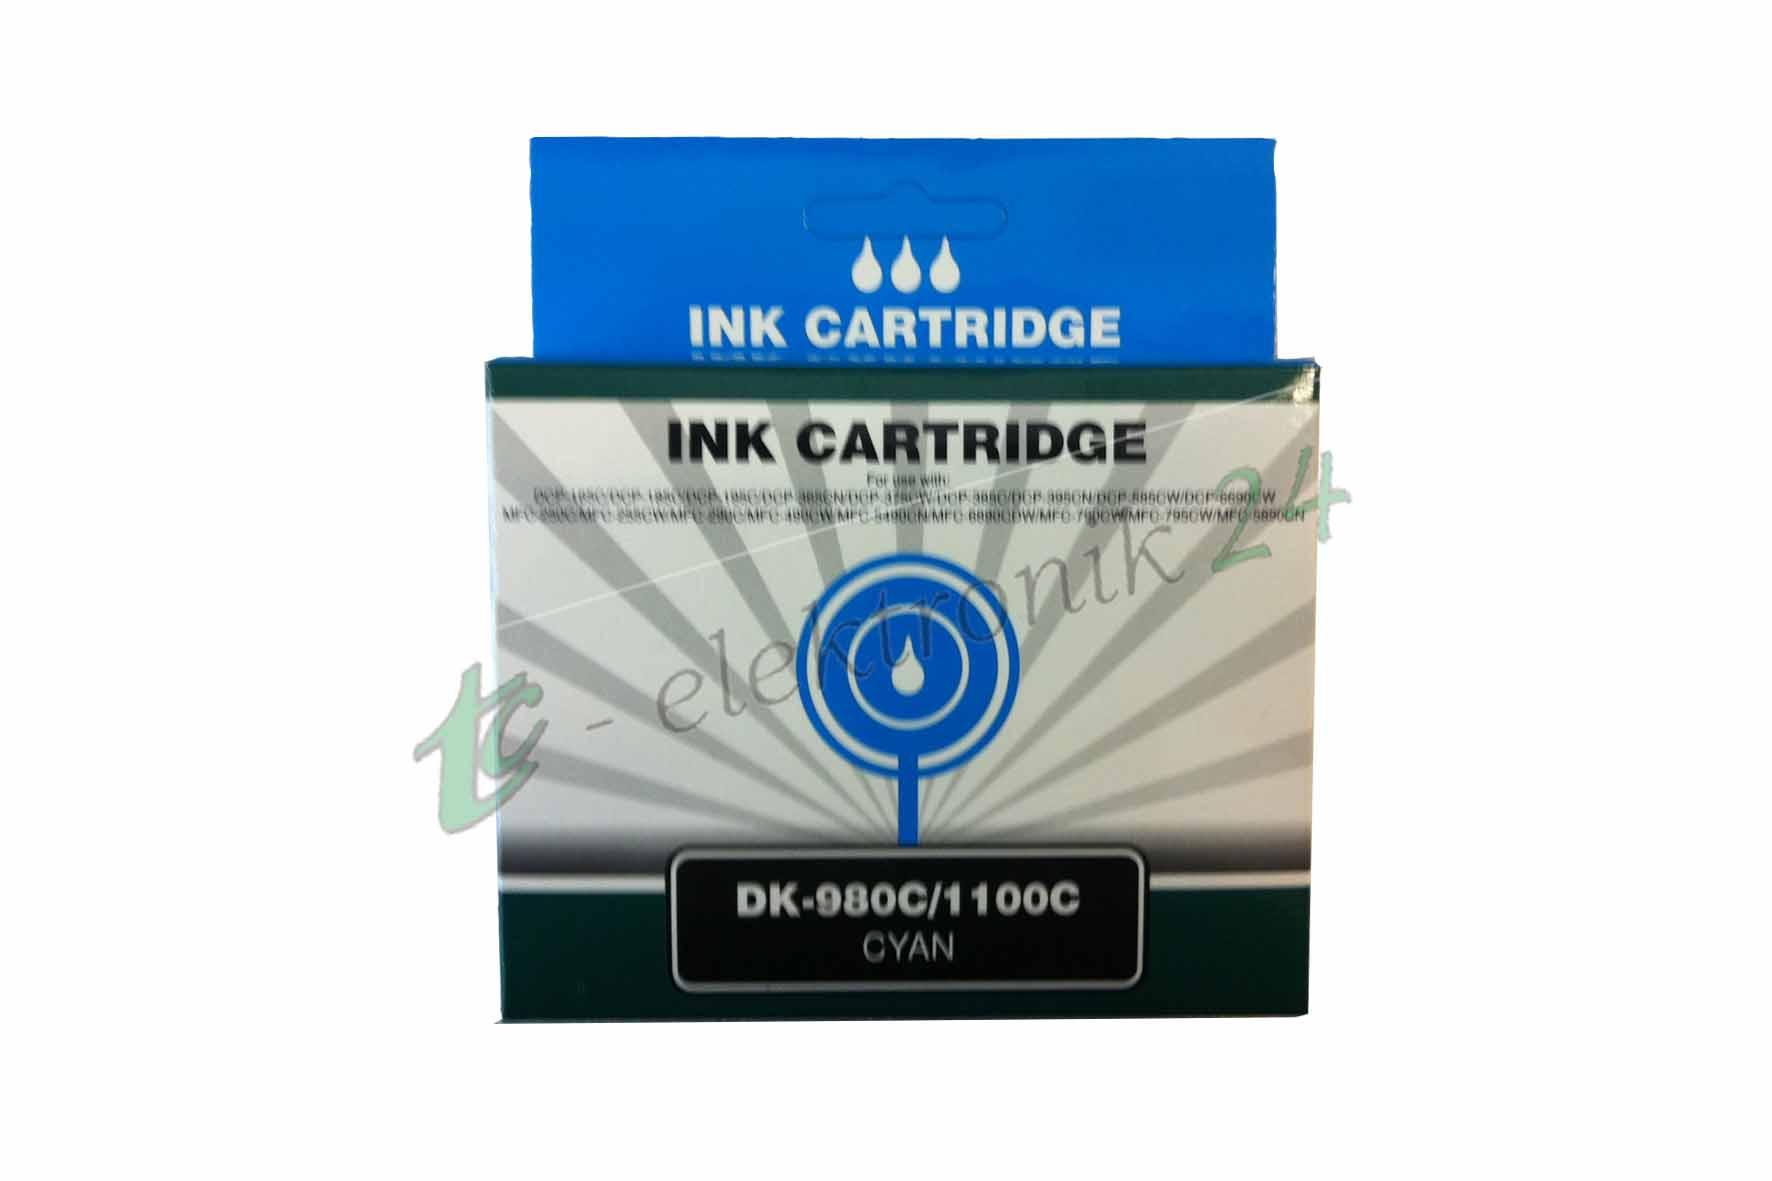 DK-970C, DK-1000C,  (Cyan), kompatibel zu LC-970C, LC-1000C (Cyan)